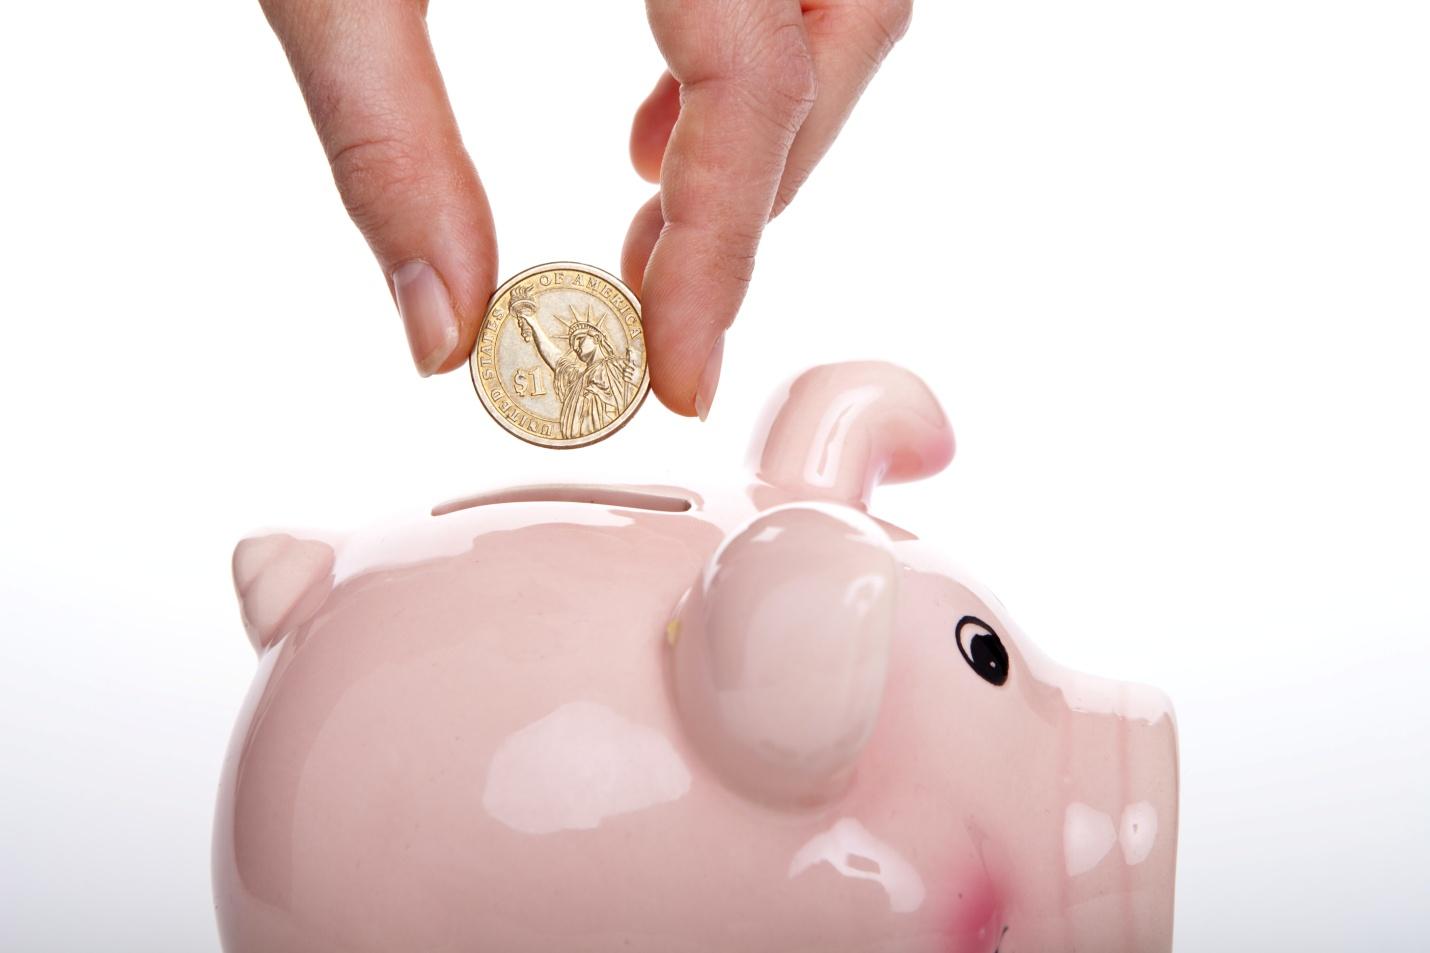 Saving money helps in the long-run